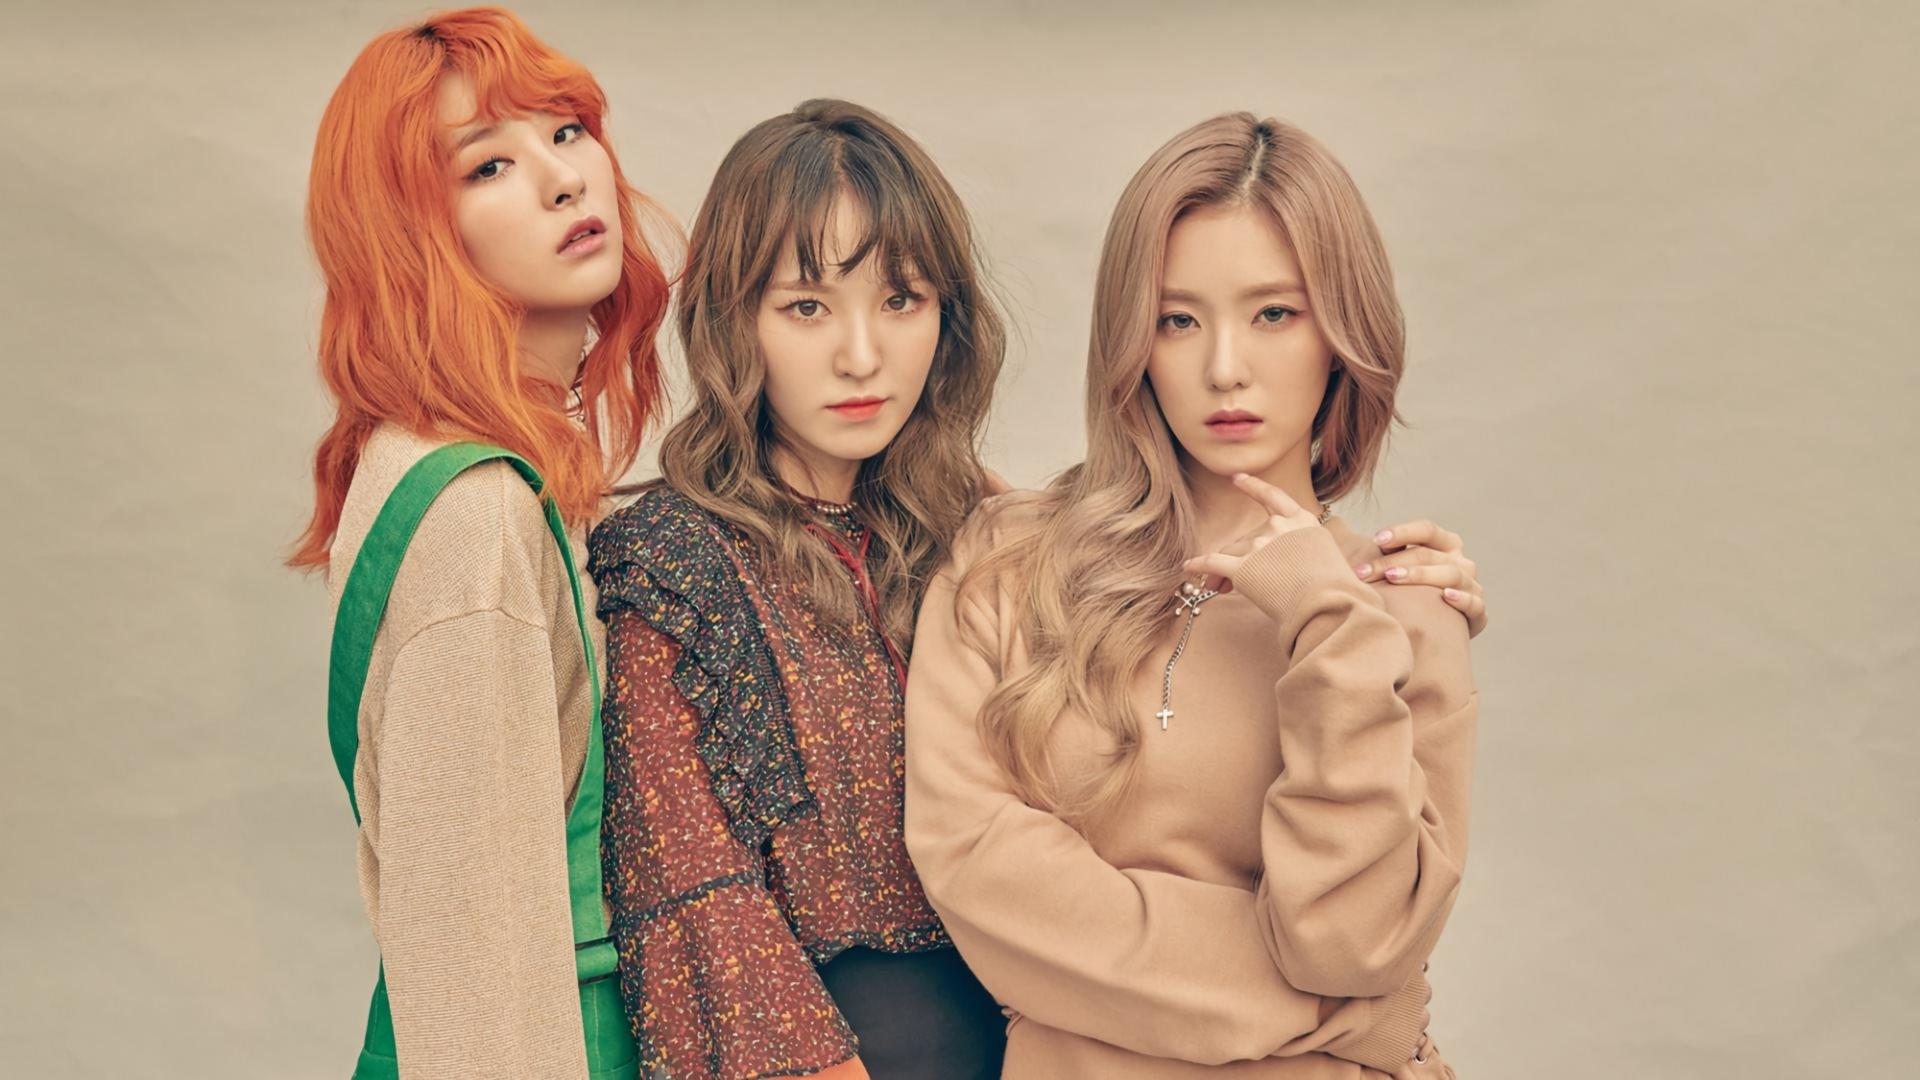 Wendy Red Velvet Wallpapers Wallpaper Cave